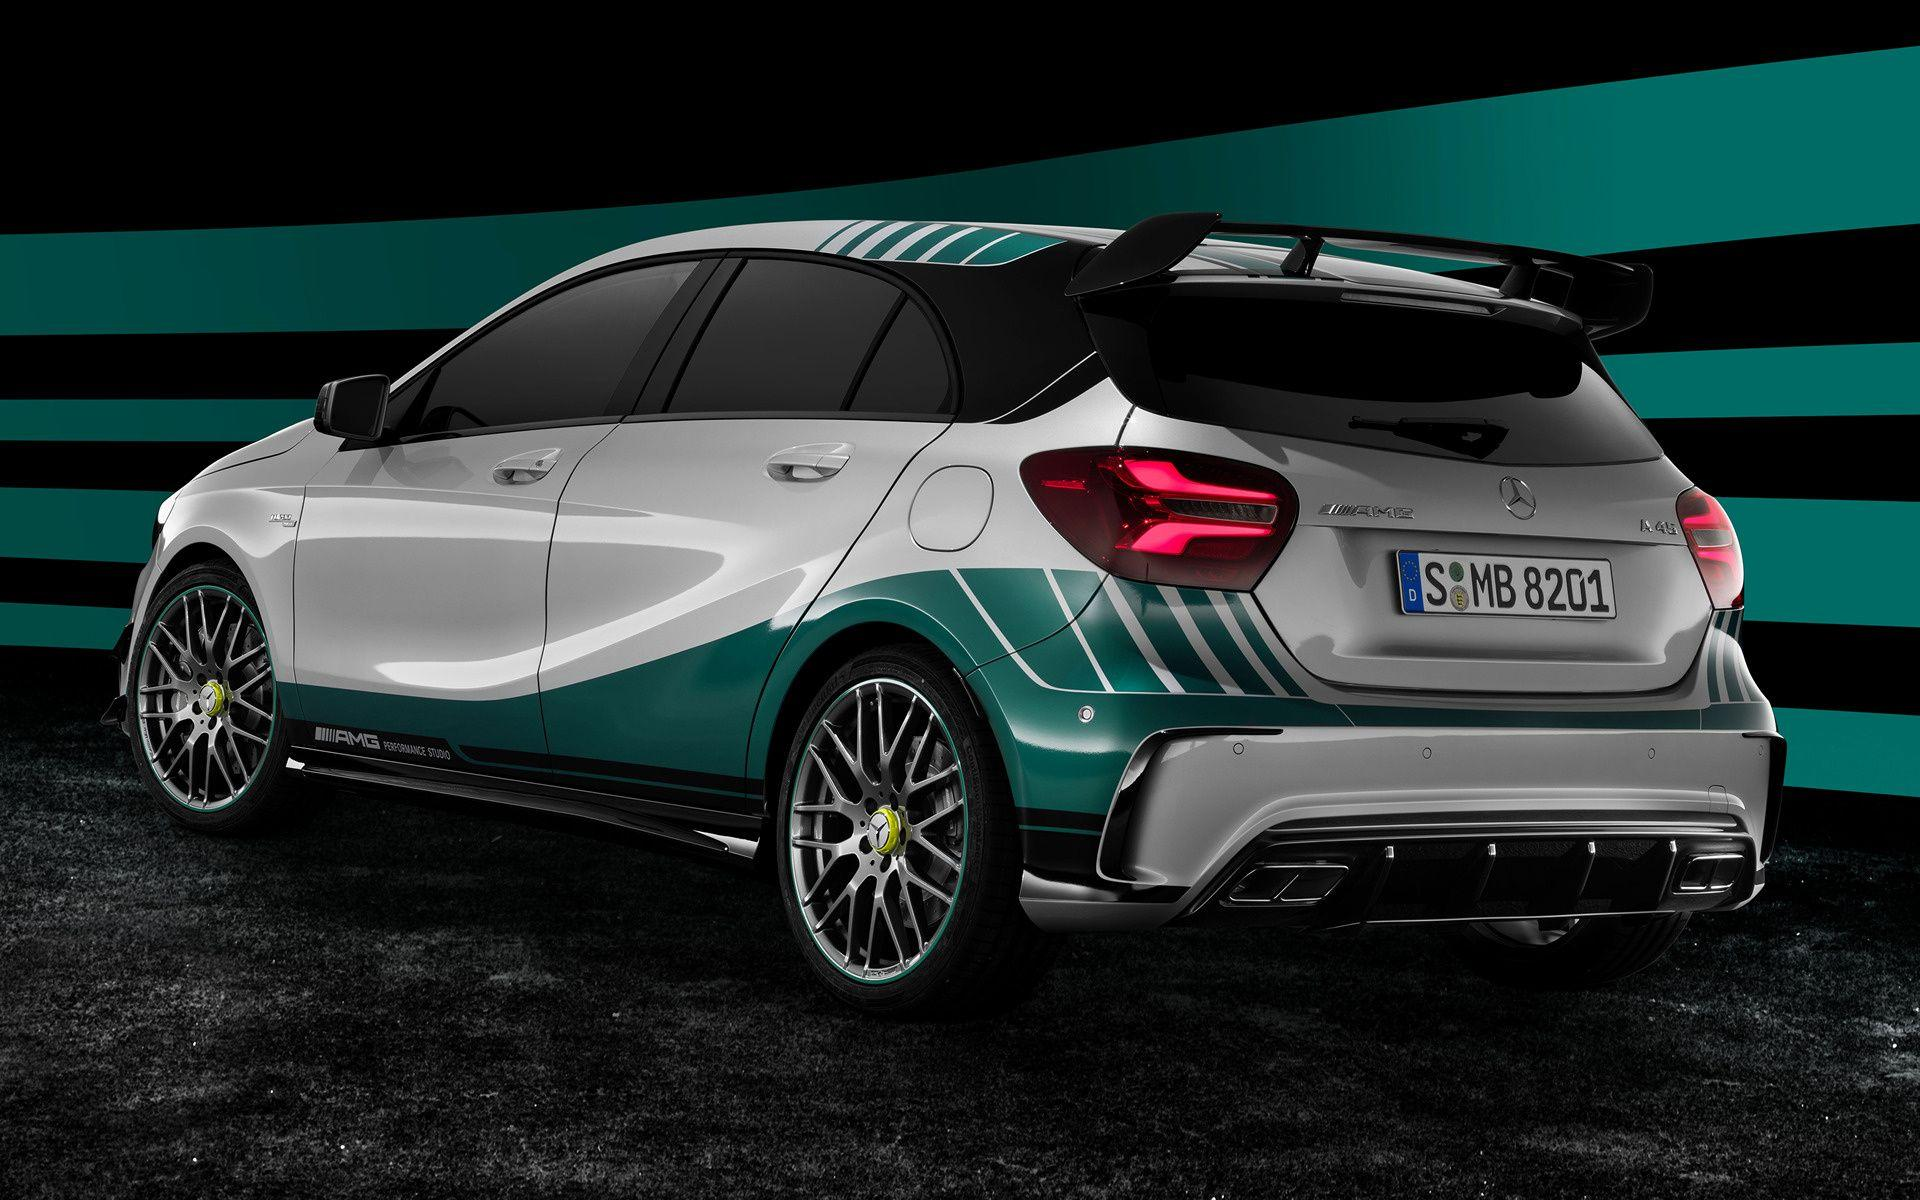 Mercedes-AMG A 45 Wallpapers - Wallpaper Cave